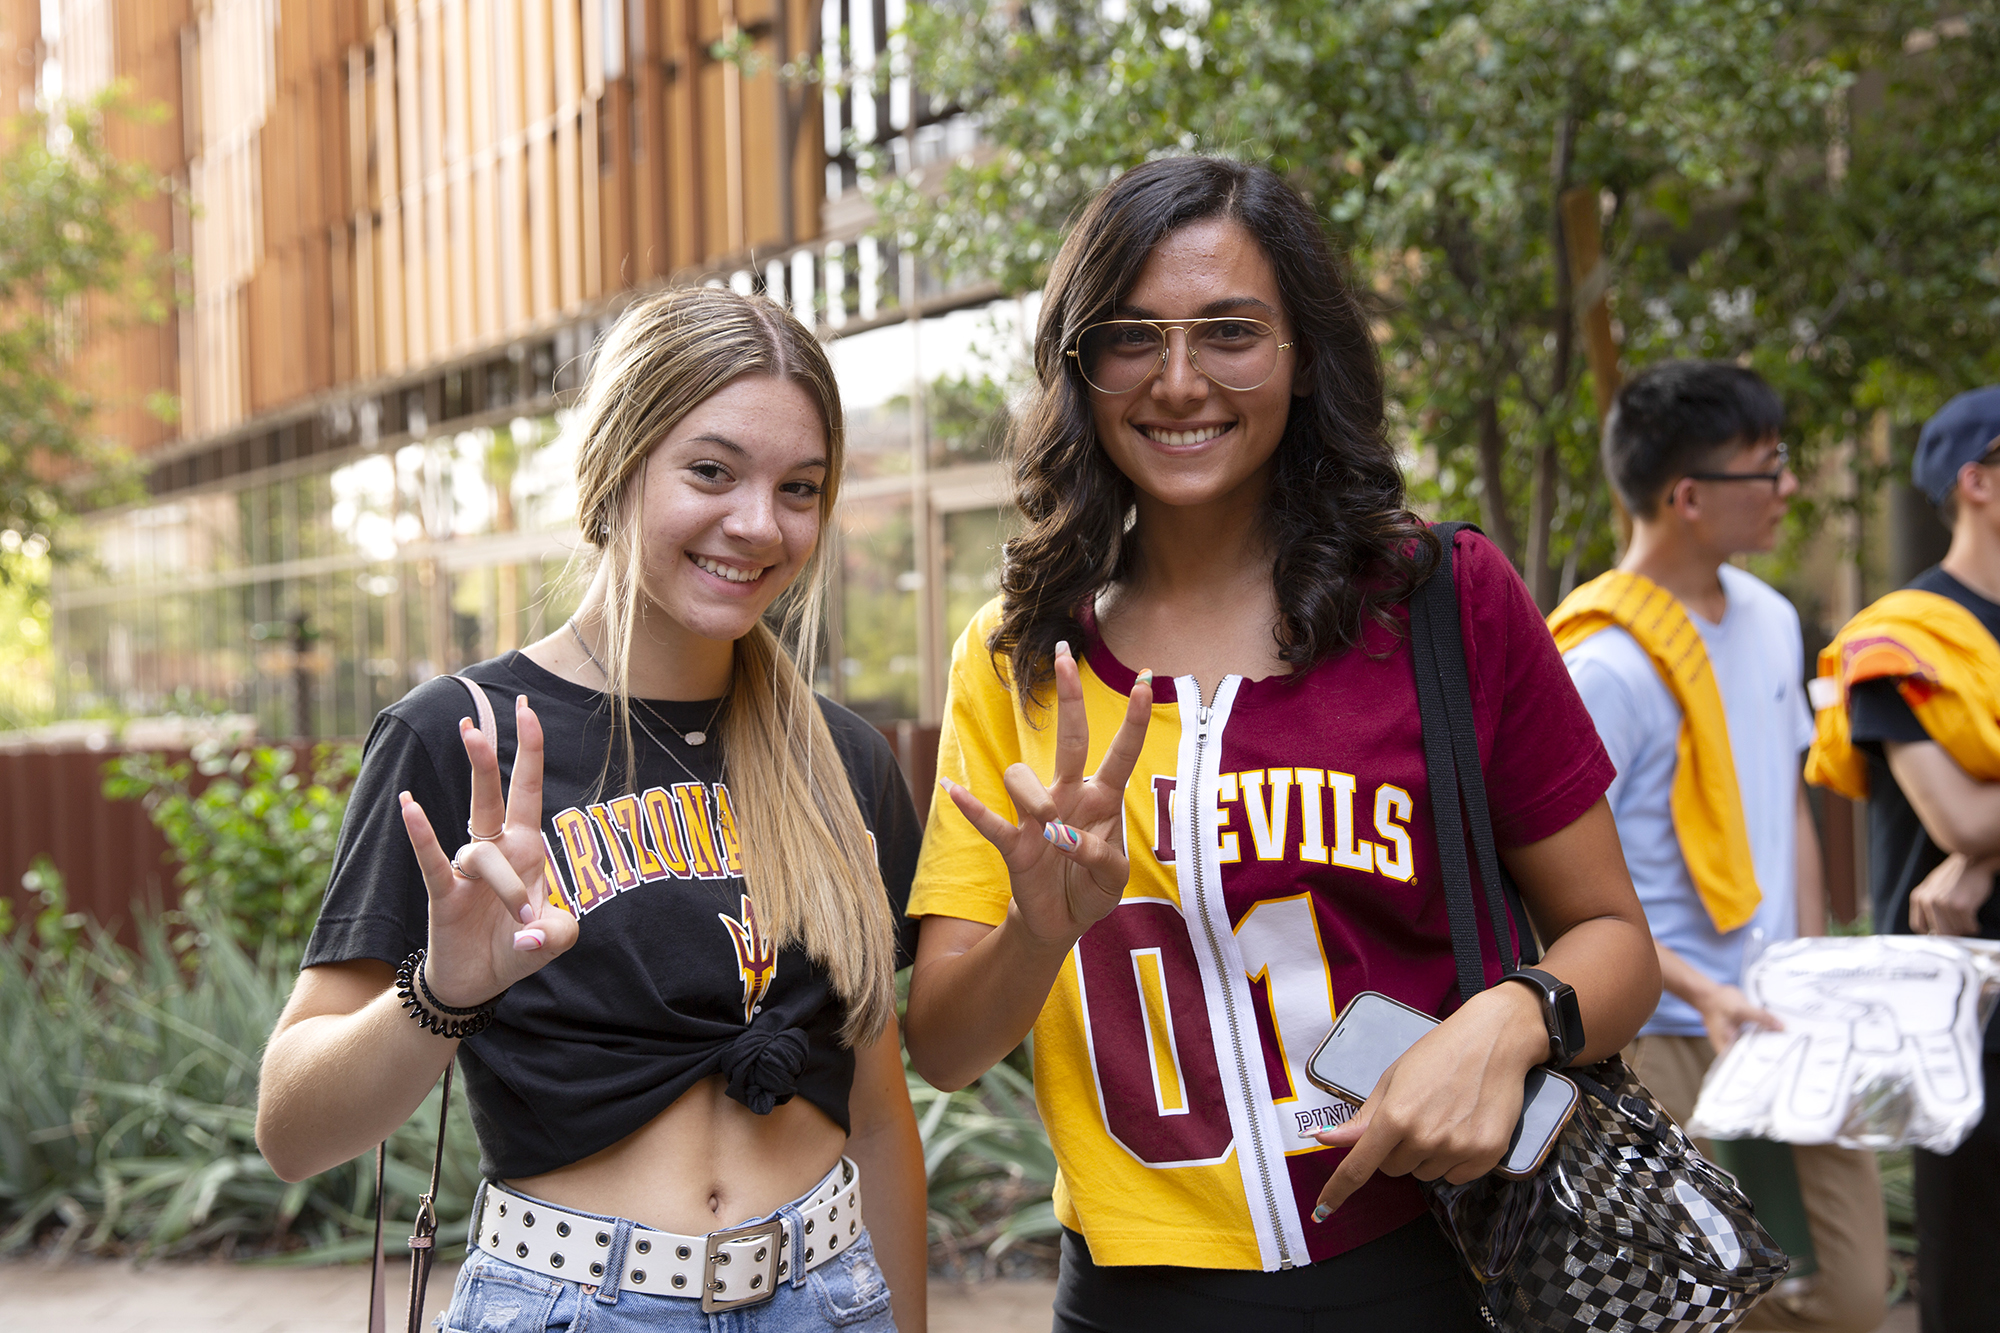 Two new students wearing ASU shirts